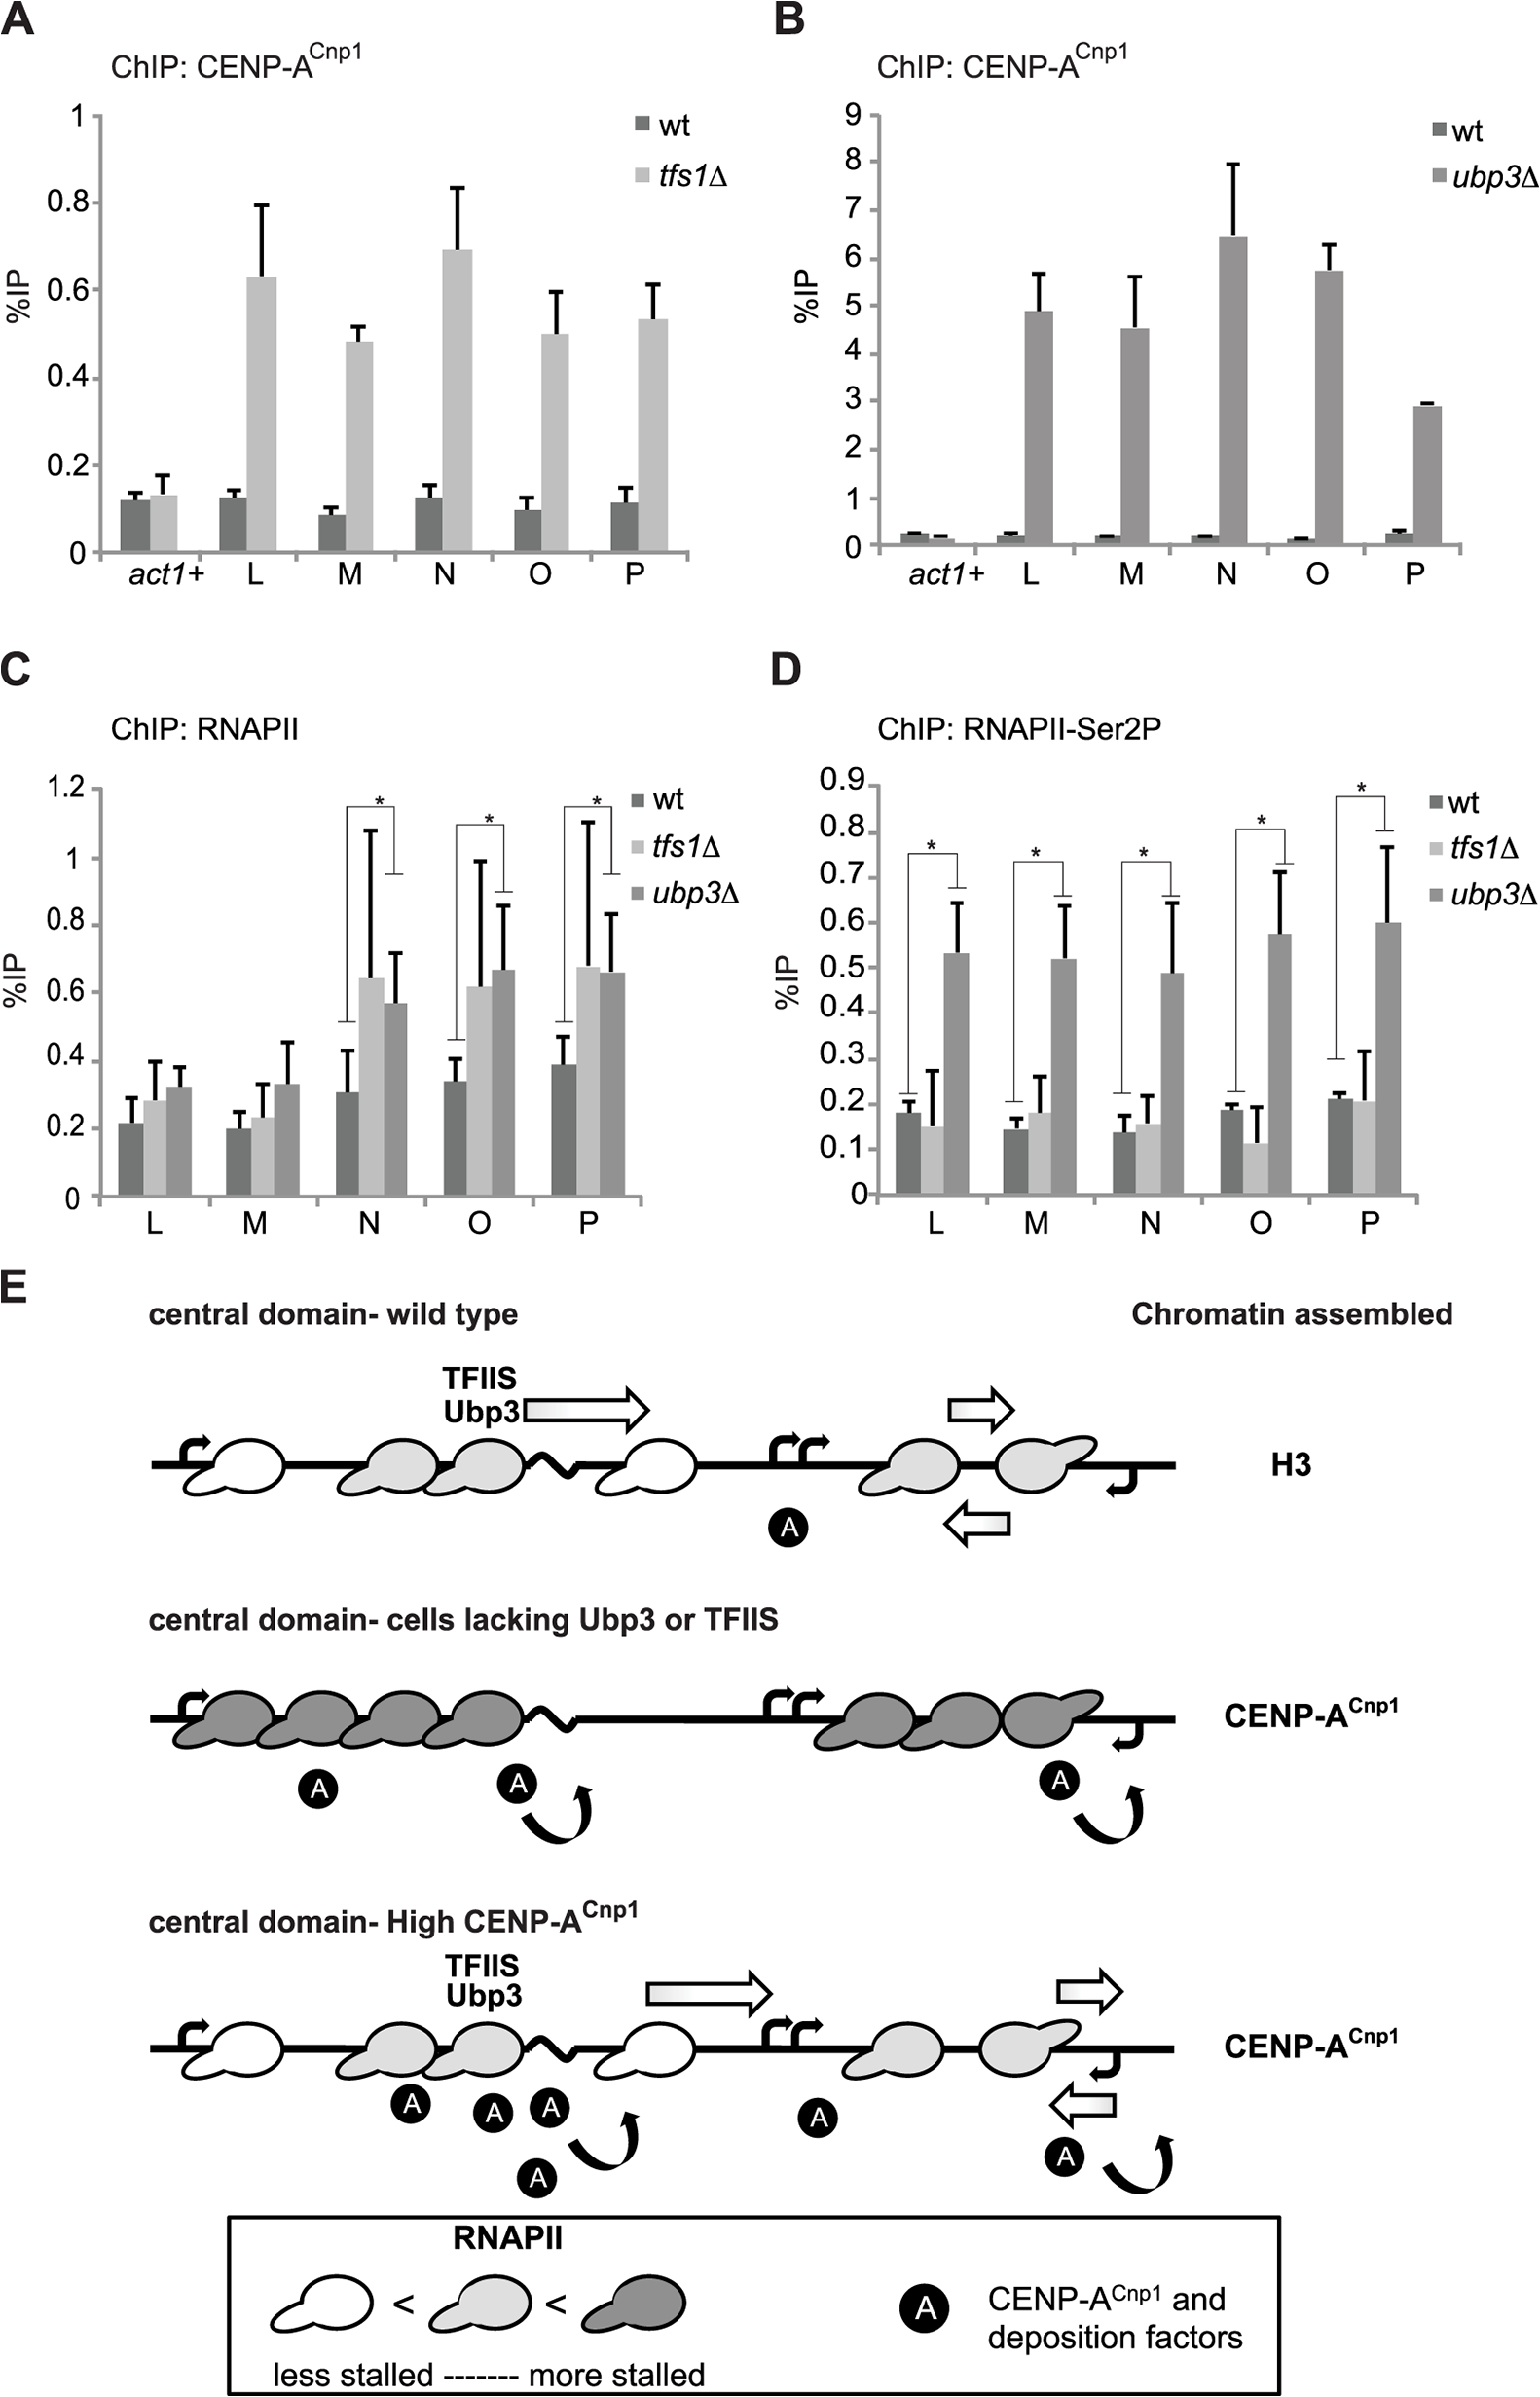 Mutants that affect RNAPII elongation allow <i>de novo</i> establishment of CENP-A<sup>Cnp1</sup> chromatin.